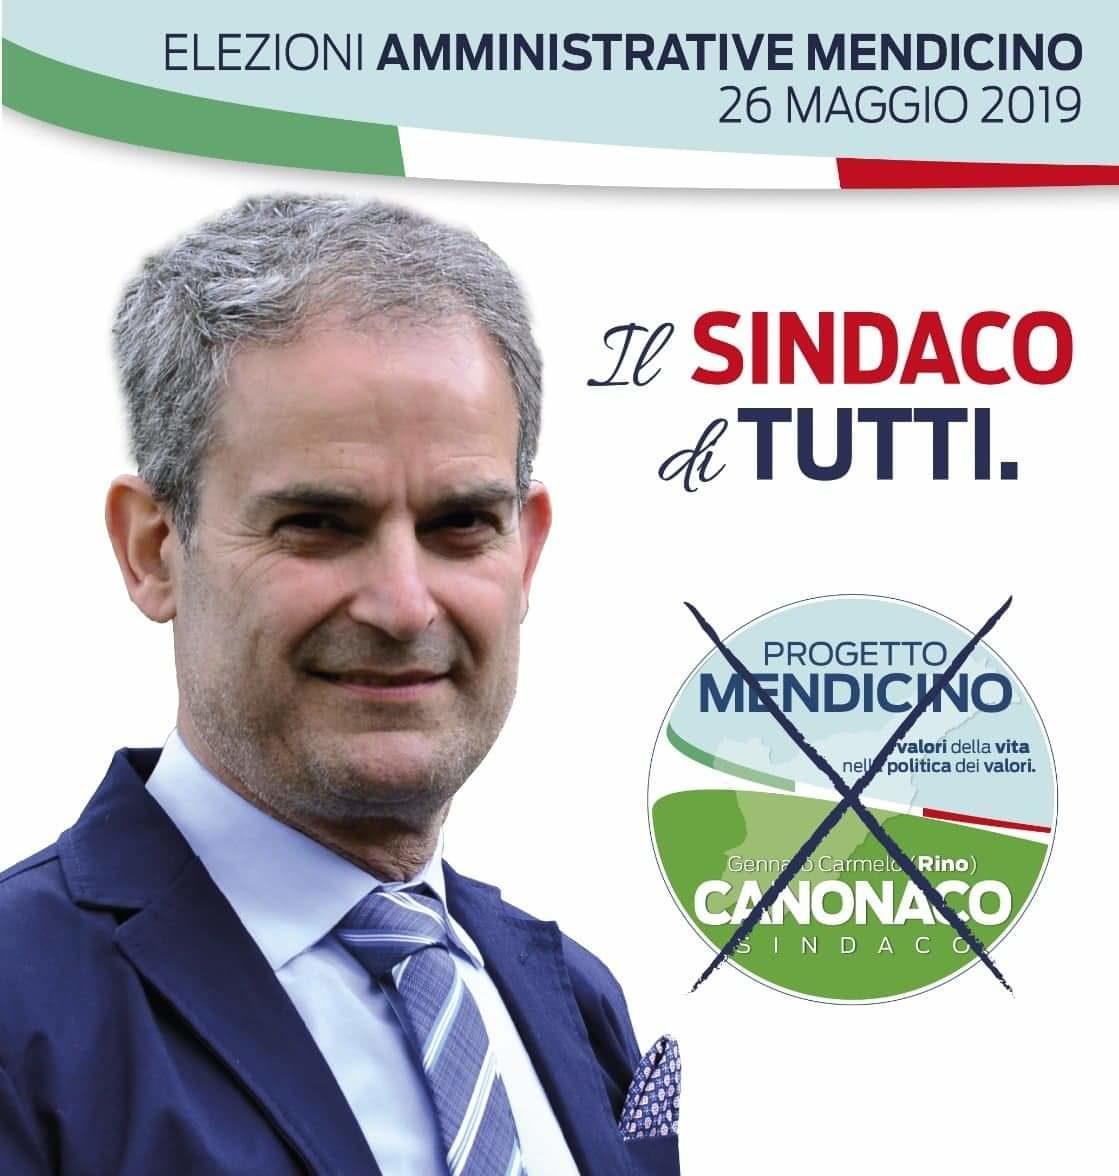 Canonaco